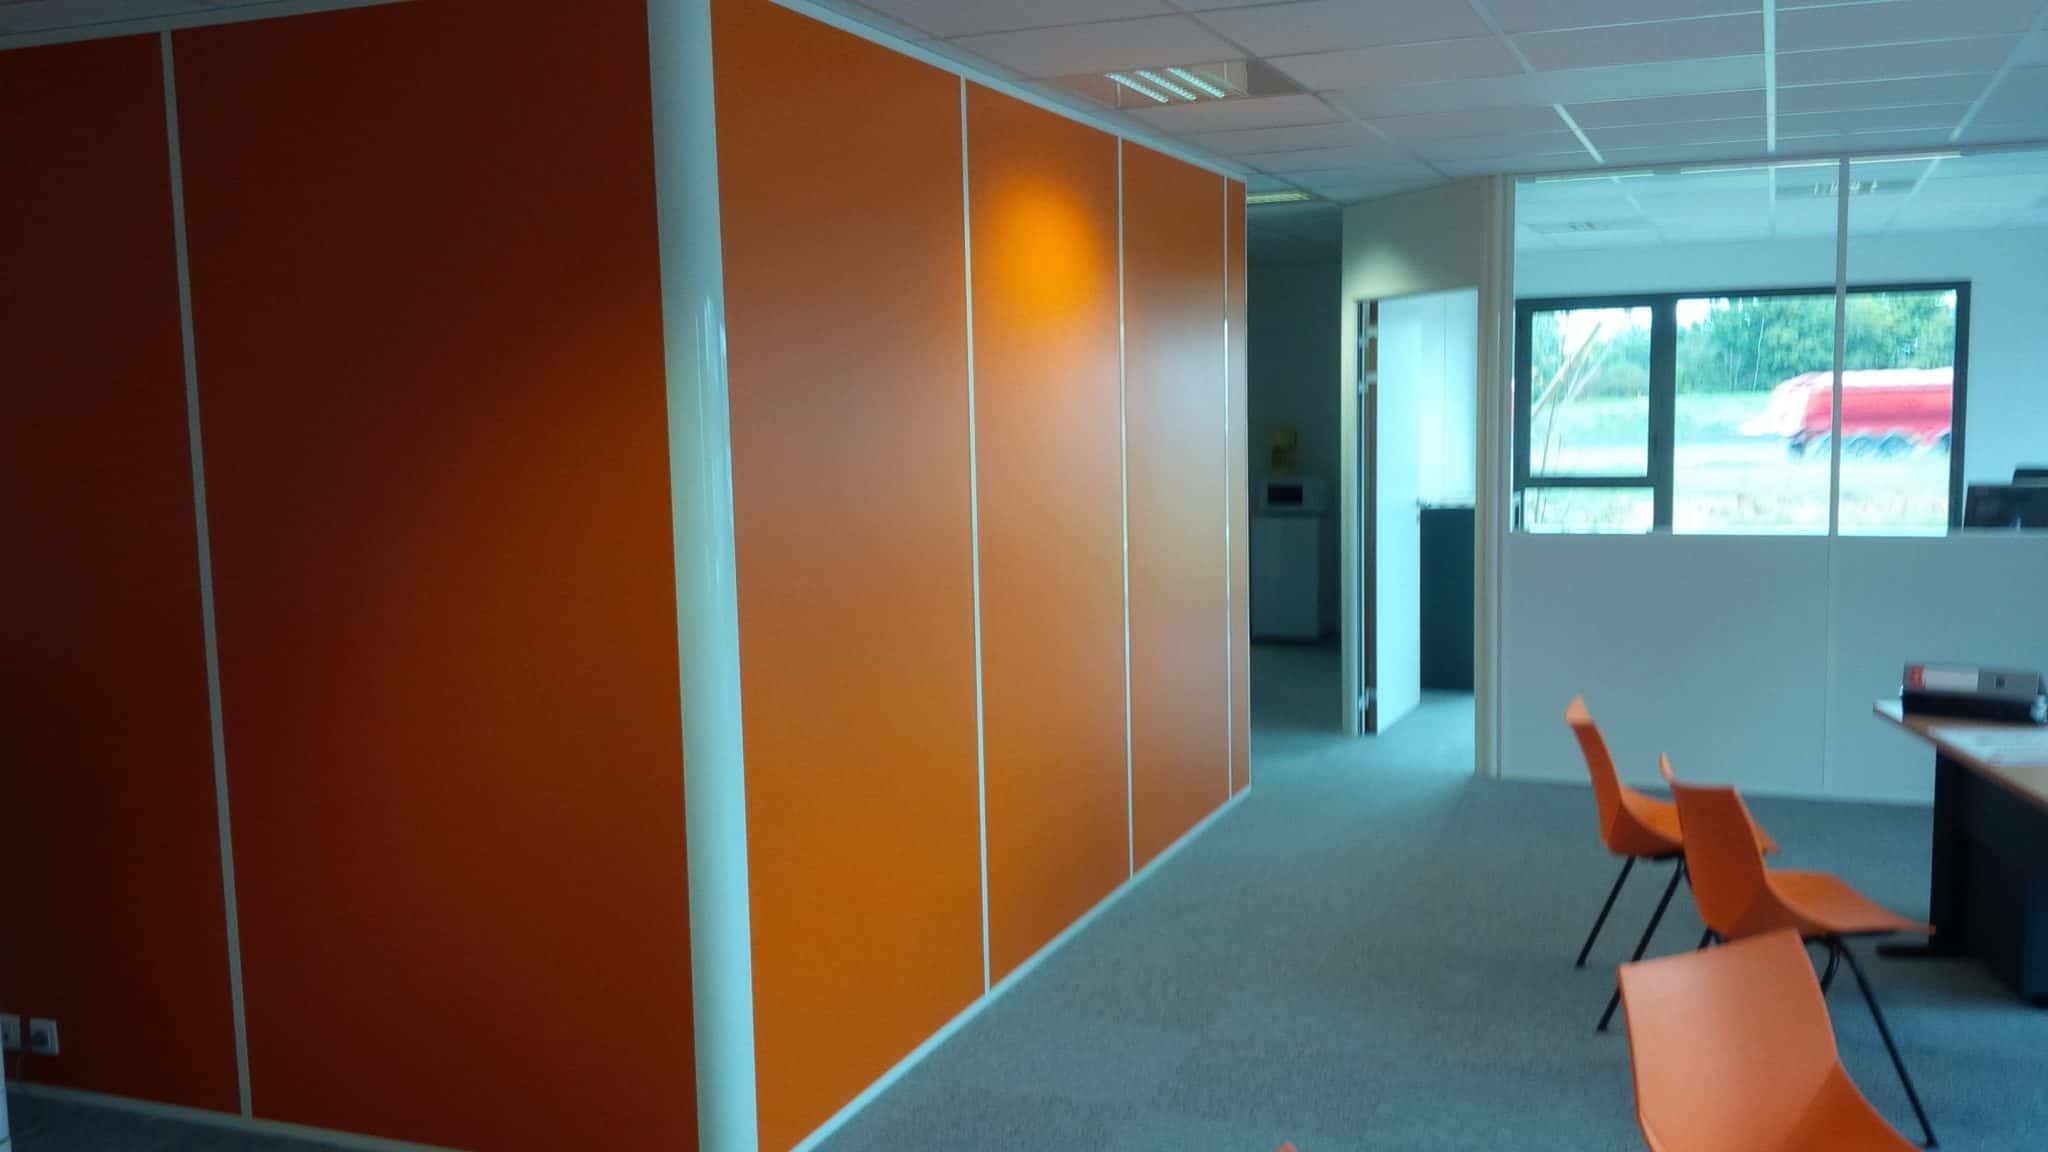 interim bureau d etudes 28 images interim a 233 ronautique interim transformation des m 233. Black Bedroom Furniture Sets. Home Design Ideas